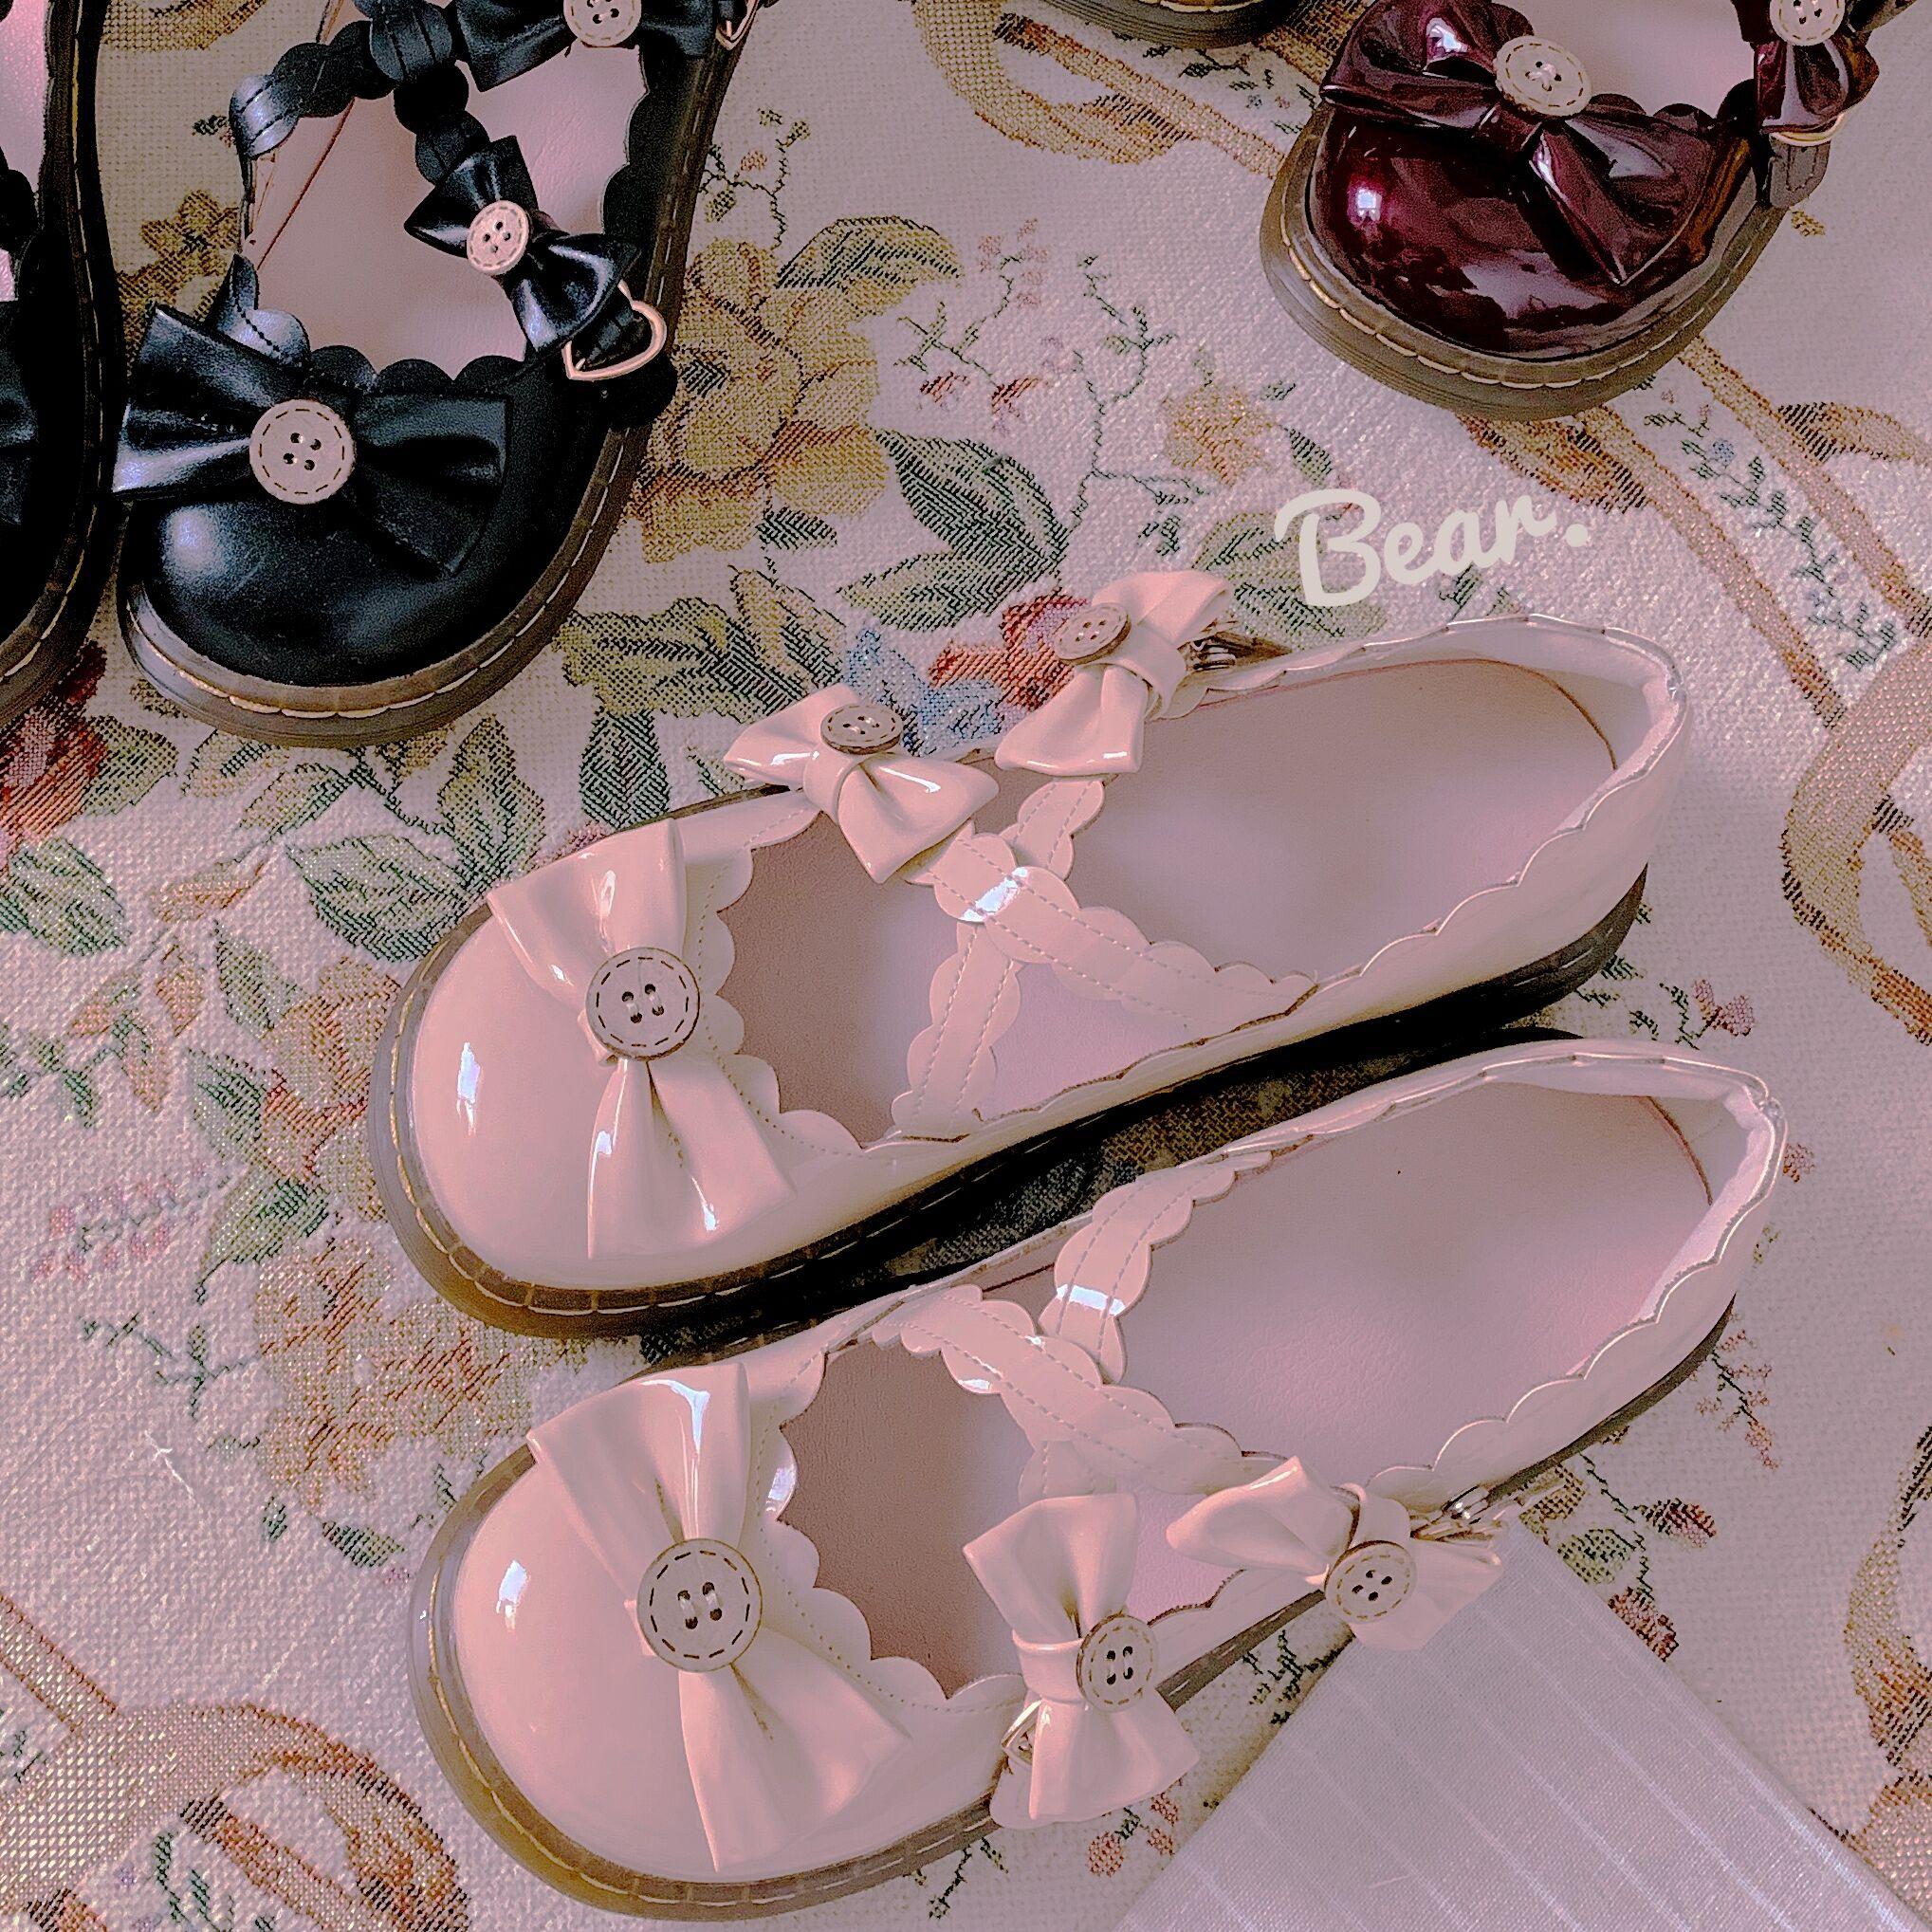 Baby bear [full stock] original womens shoes of world grape Lolita